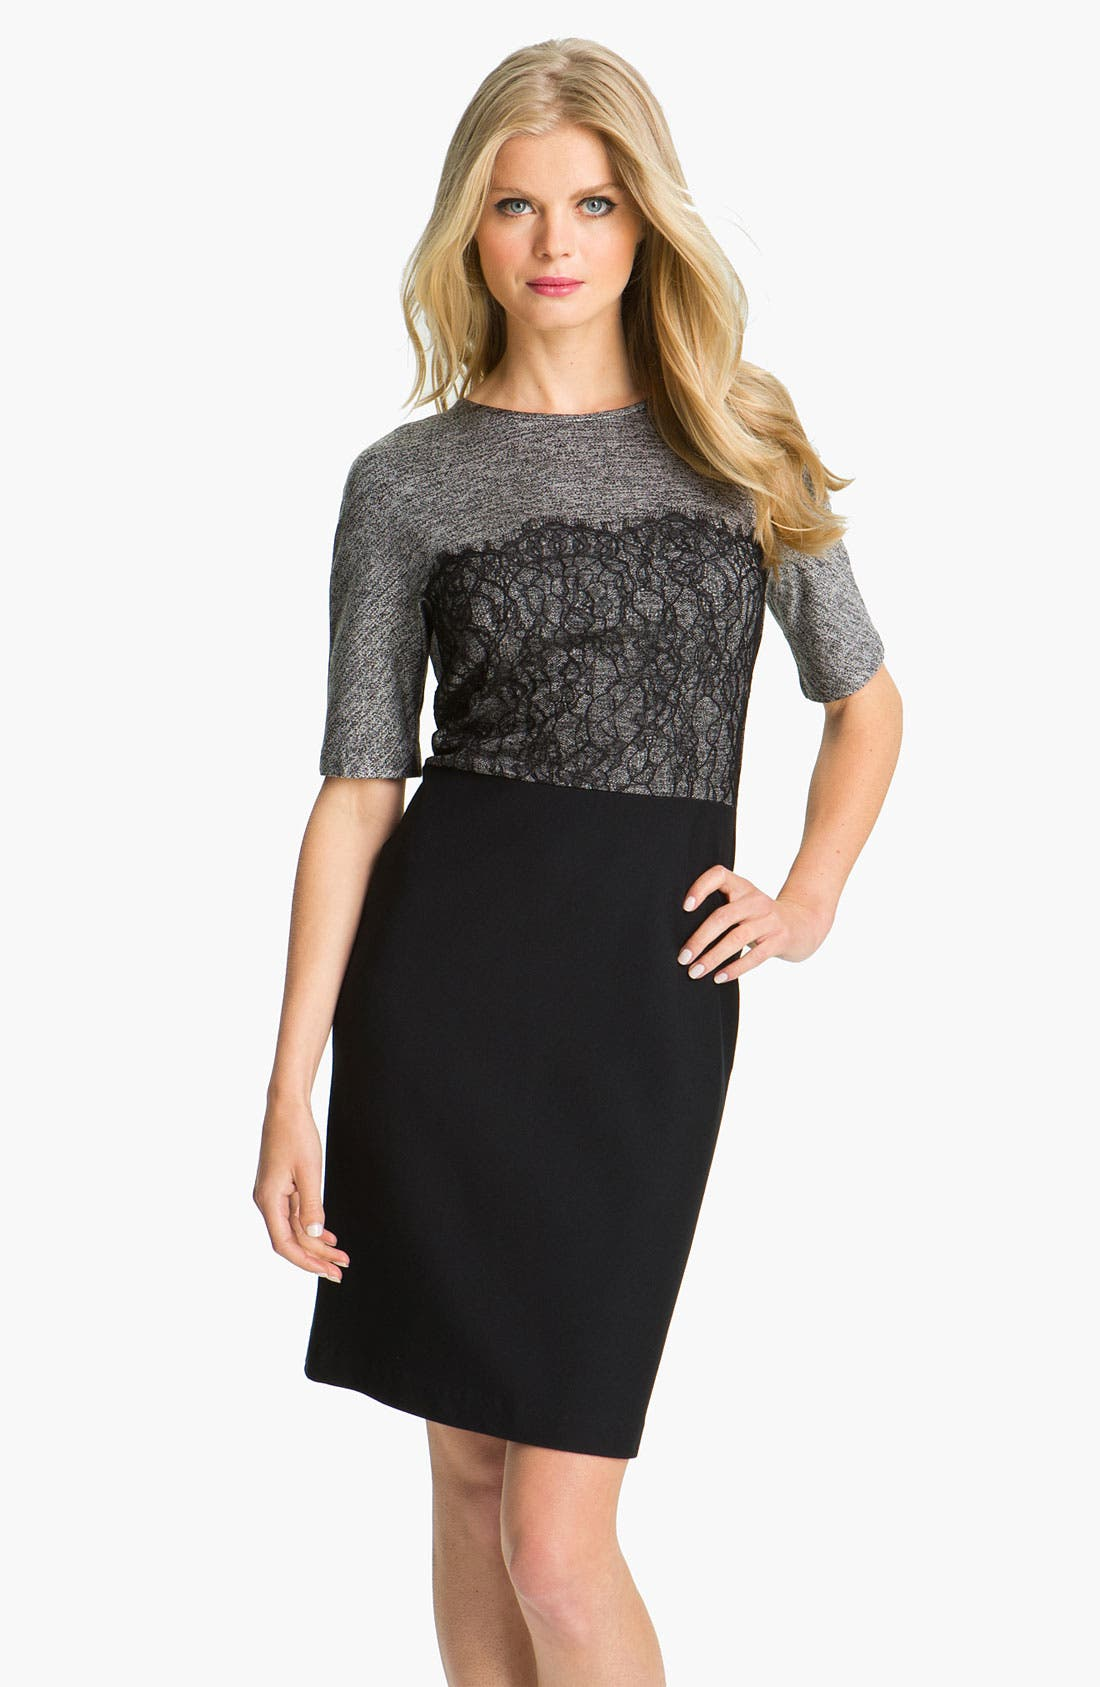 Main Image - Suzi Chin for Maggy Boutique Mixed Media Sheath Dress